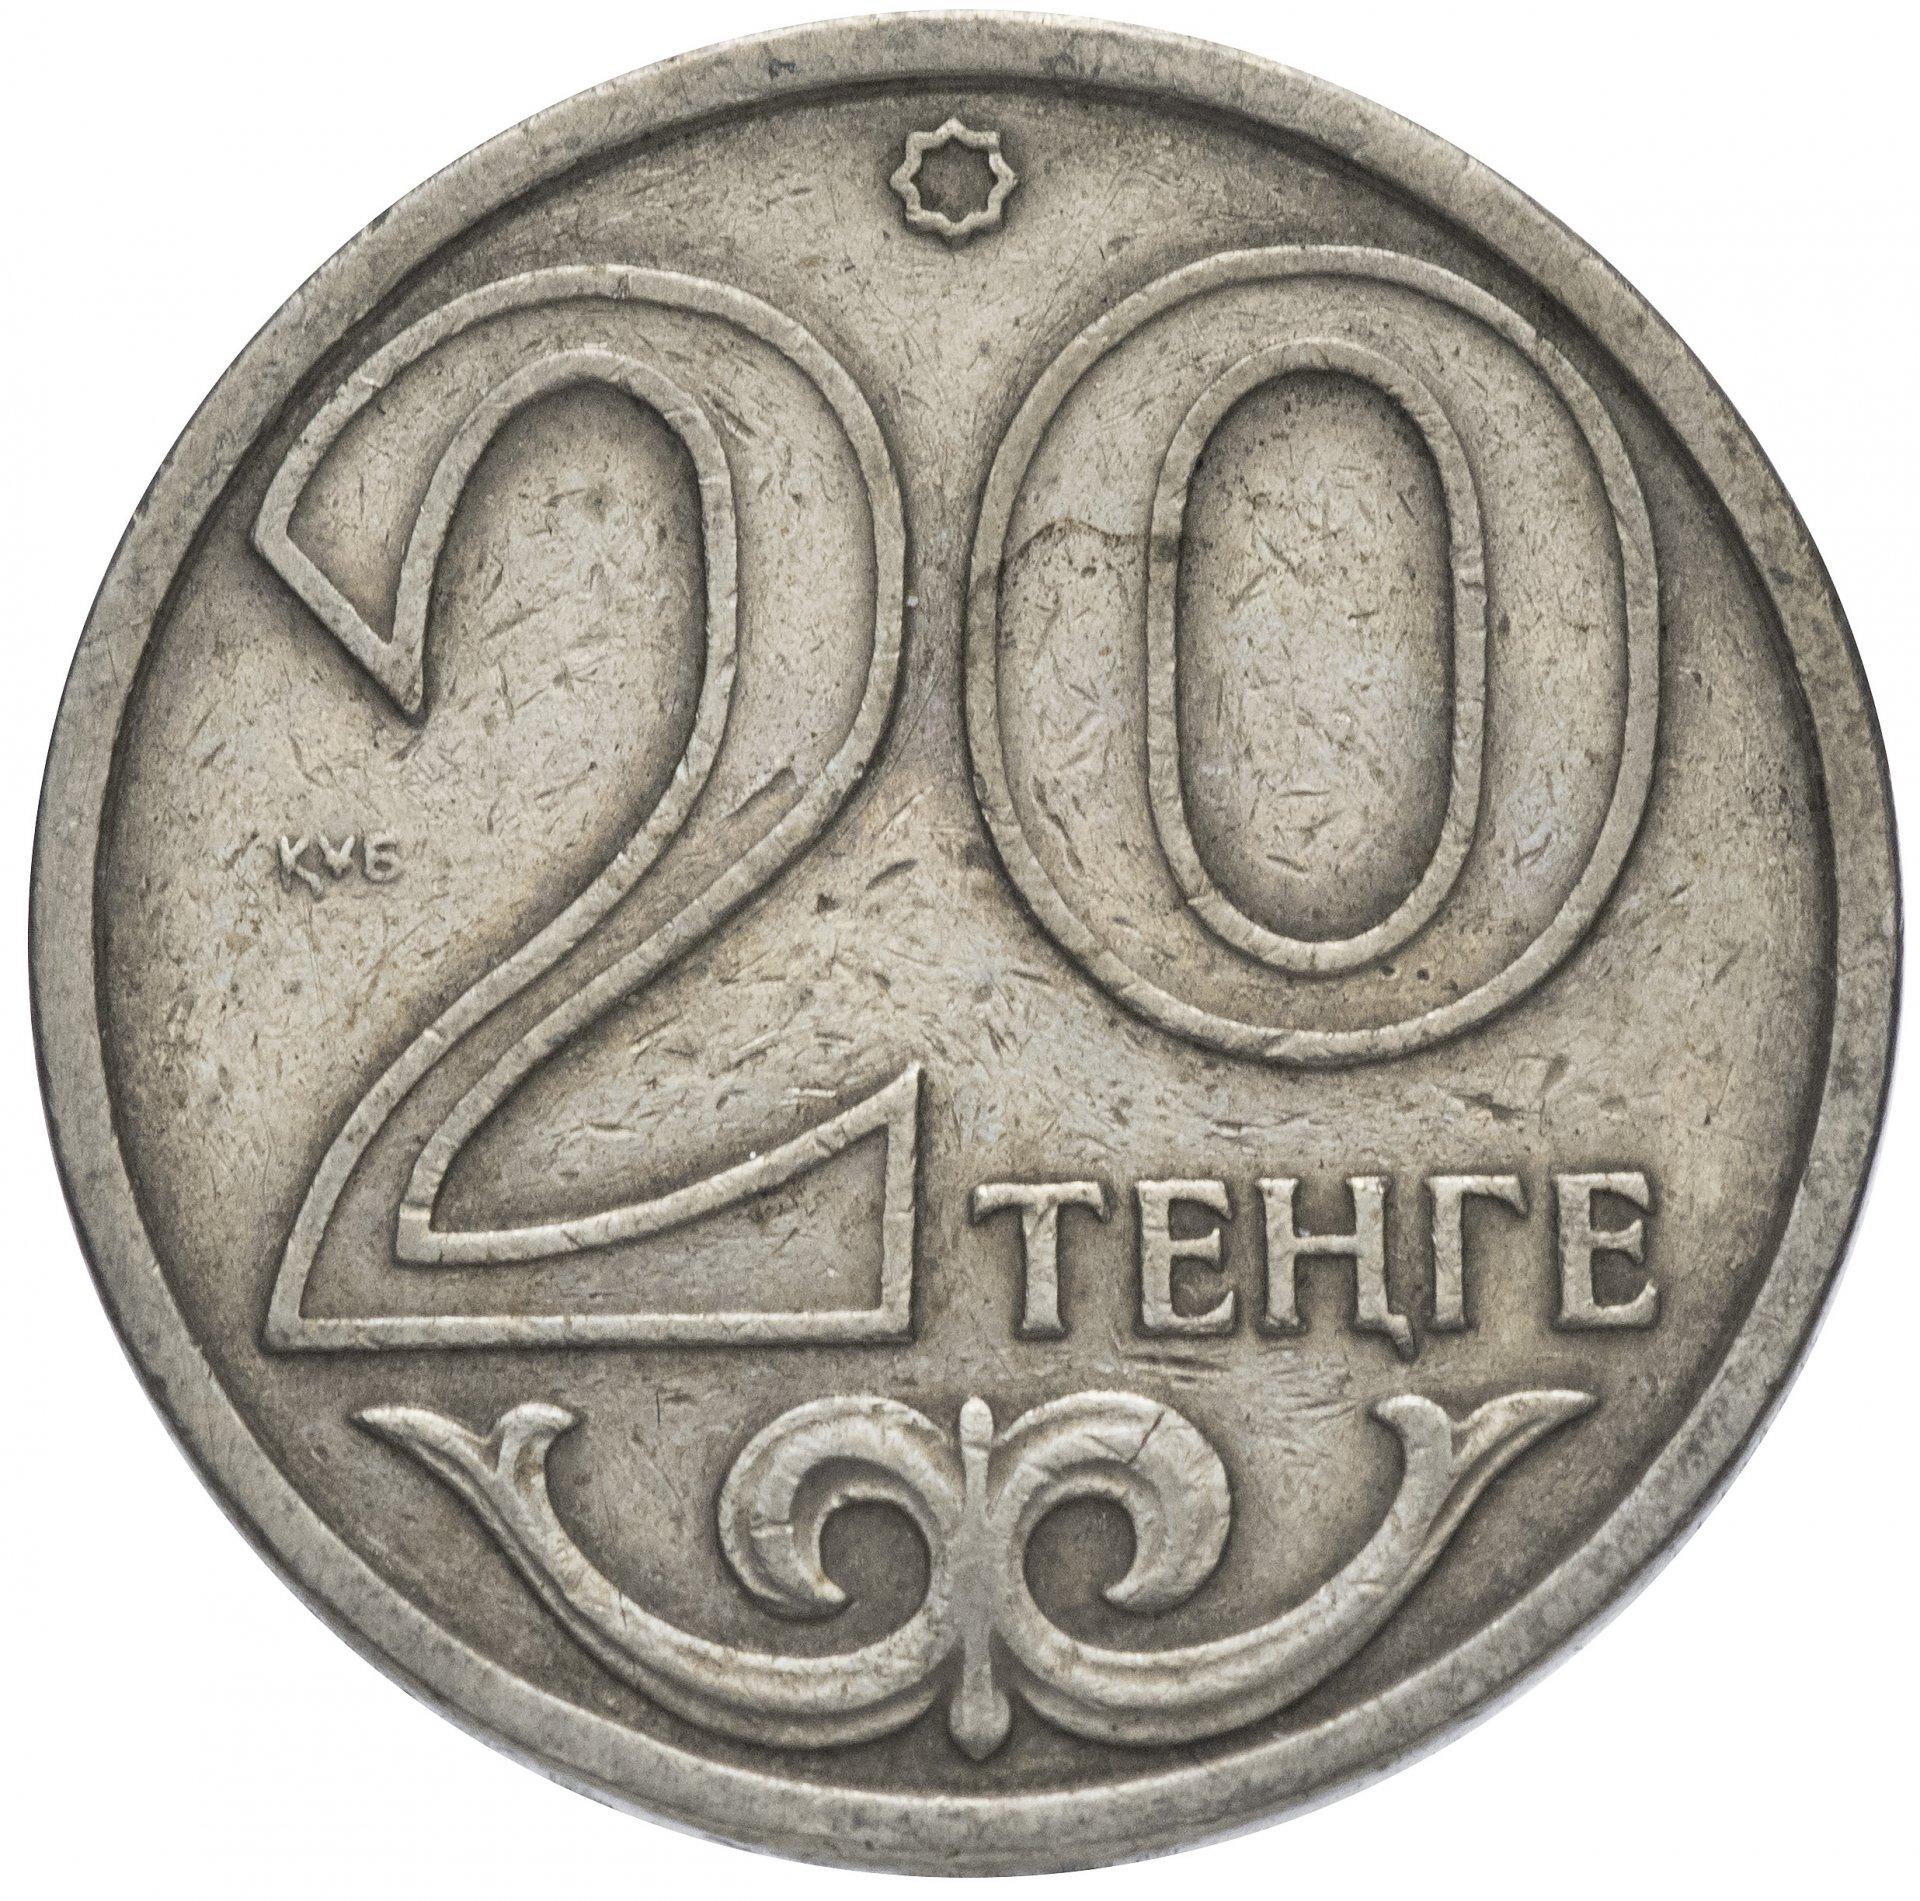 Картинки монеты тенге, открытки приколы пожелание